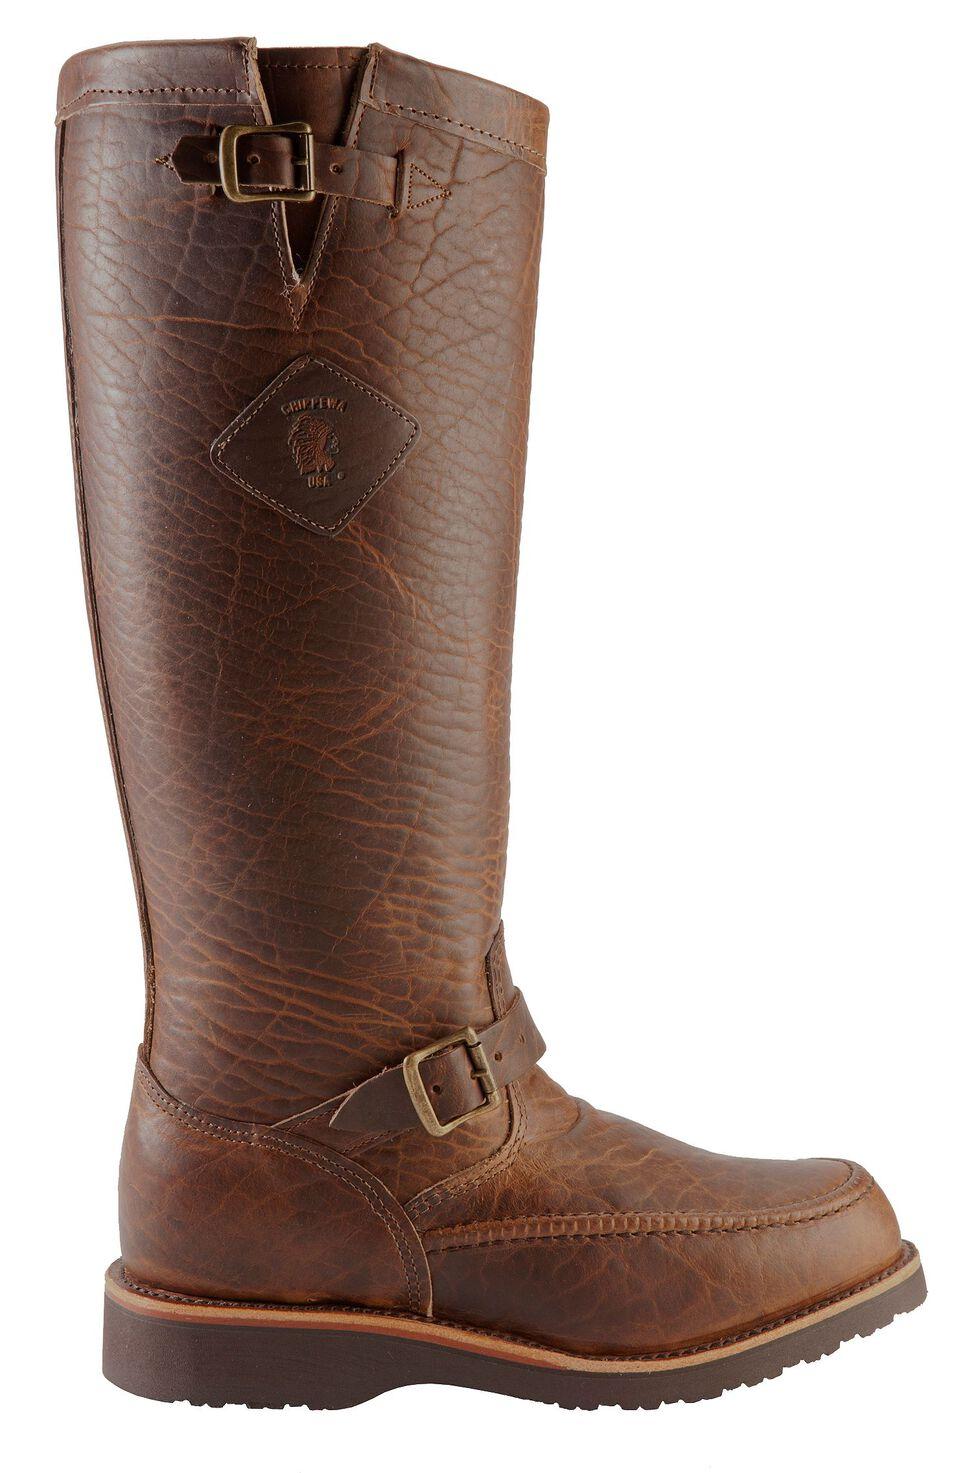 Chippewa Iowa American Bison Snake Boots - Mocc Toe, Tan, hi-res